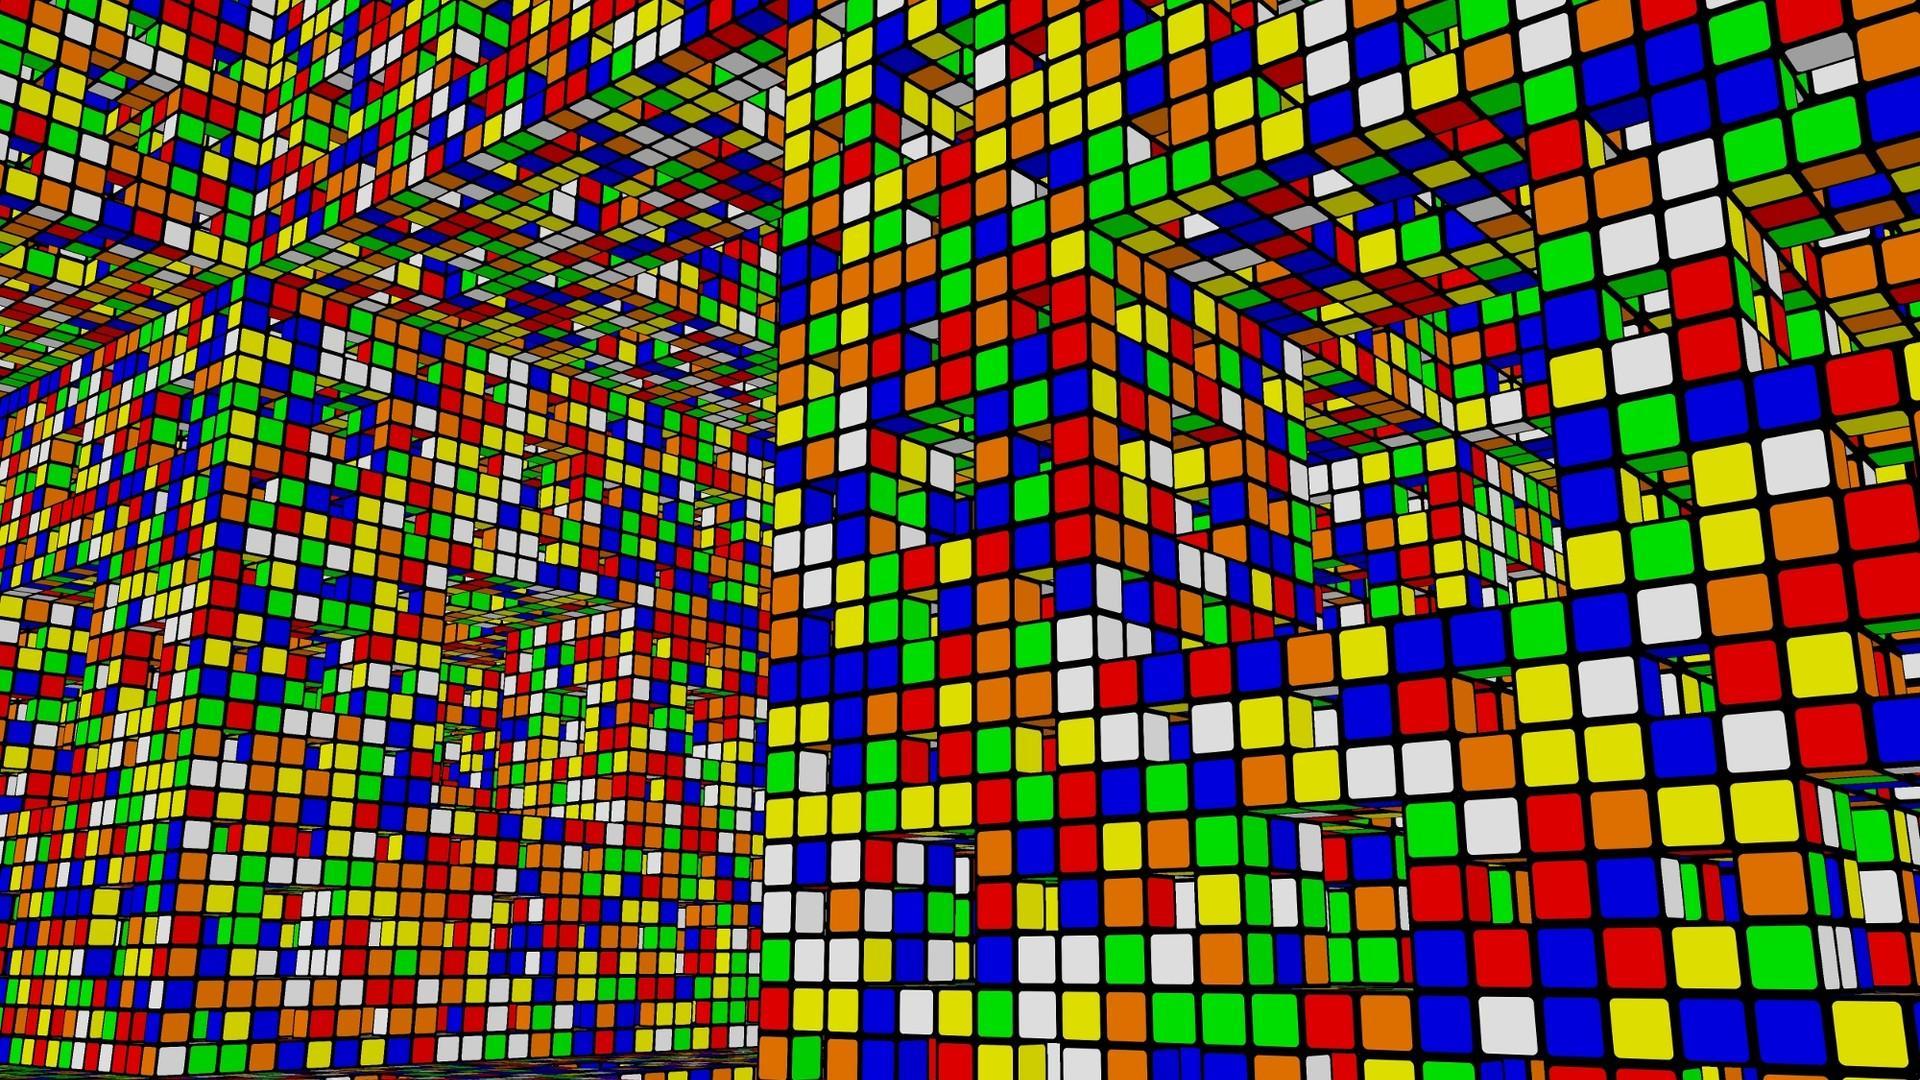 optical illusions wallpaper - Page 2 of 3 - wallpaper21.com